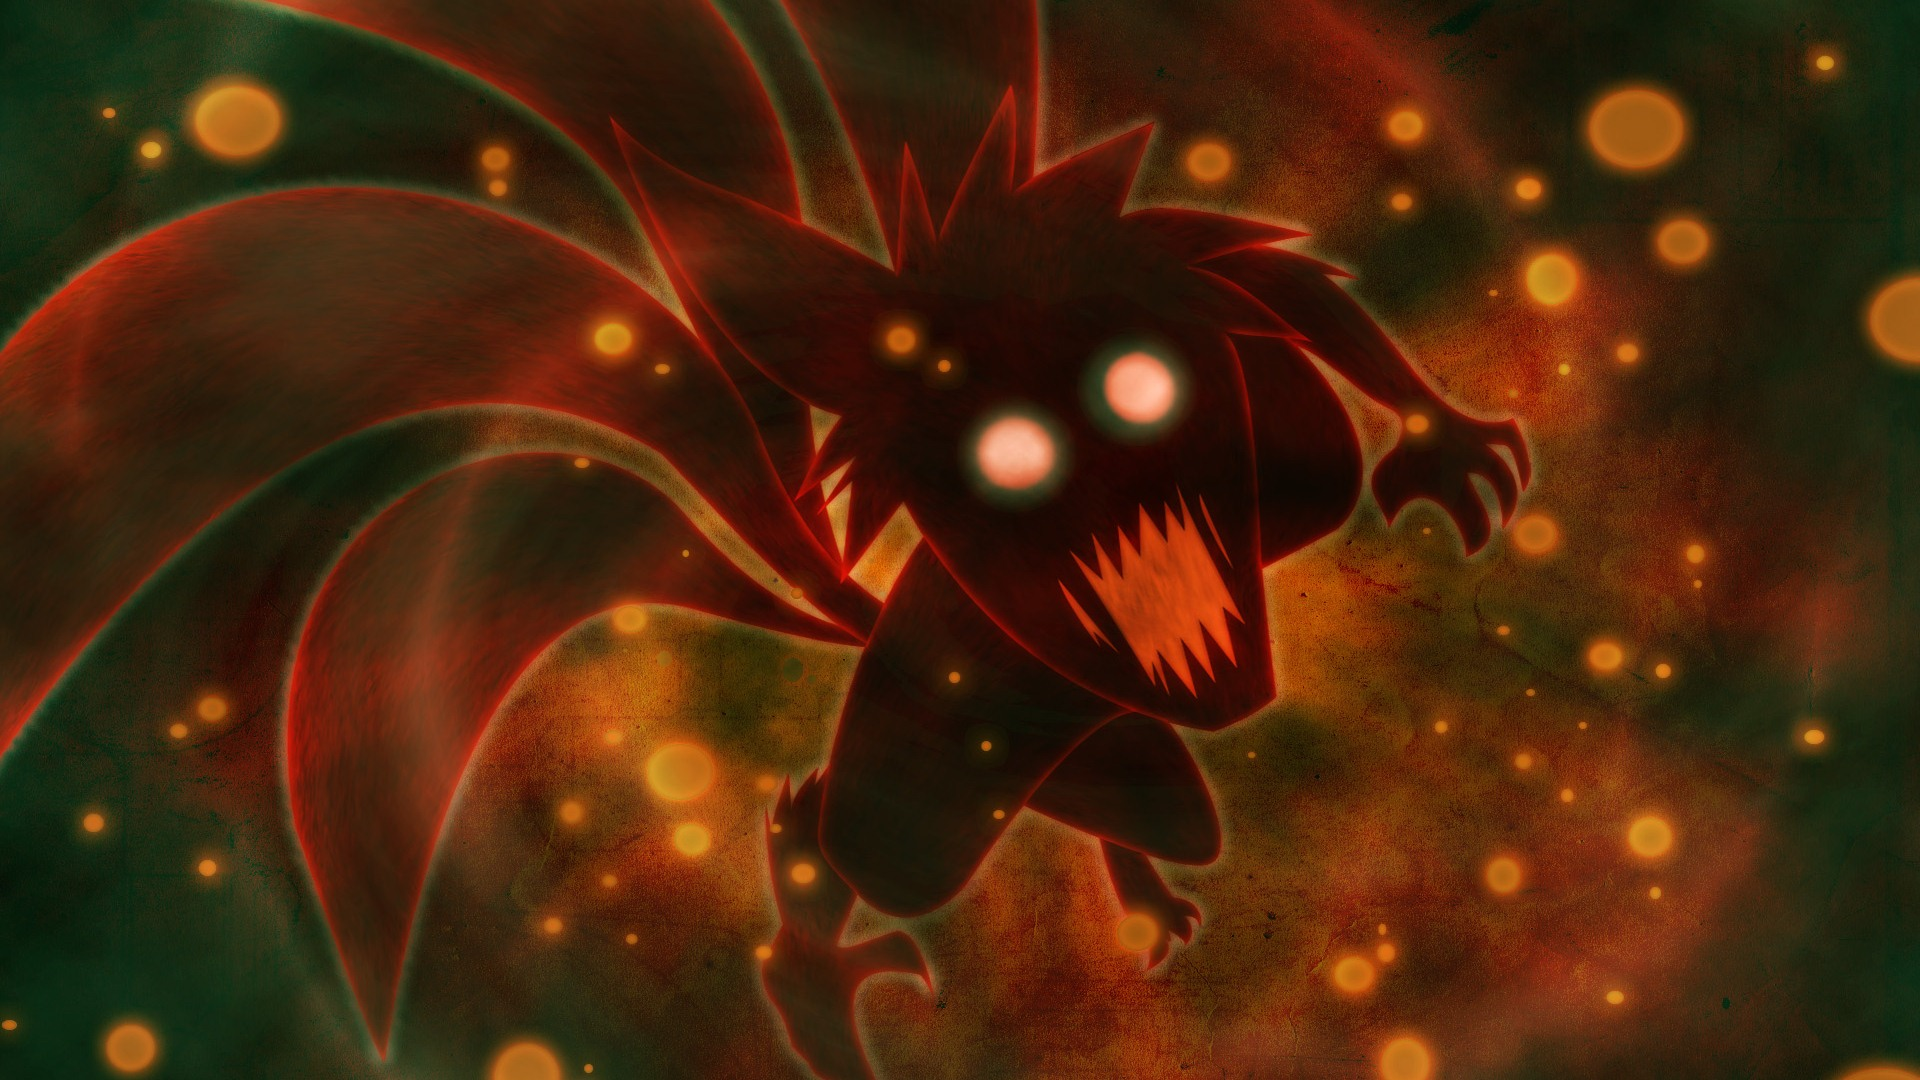 fond d'ecran anime 1920x1080